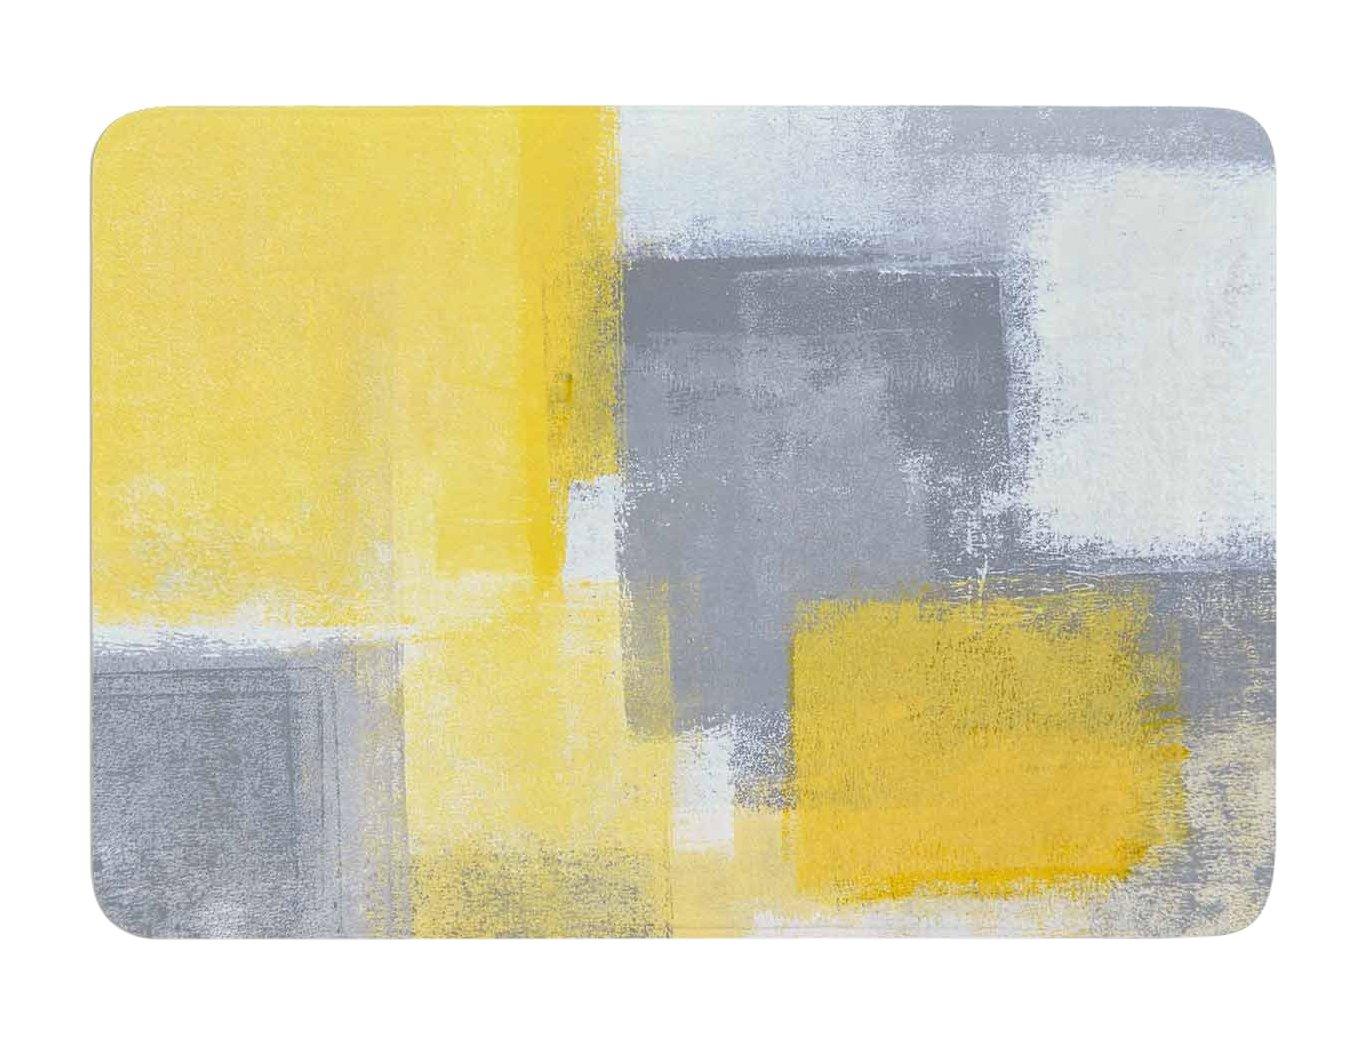 Kess InHouse Carollynn TICE Steady Yellow Gray Memory Foam Bath Mat, 17 by 24-Inch, 17' X 24'